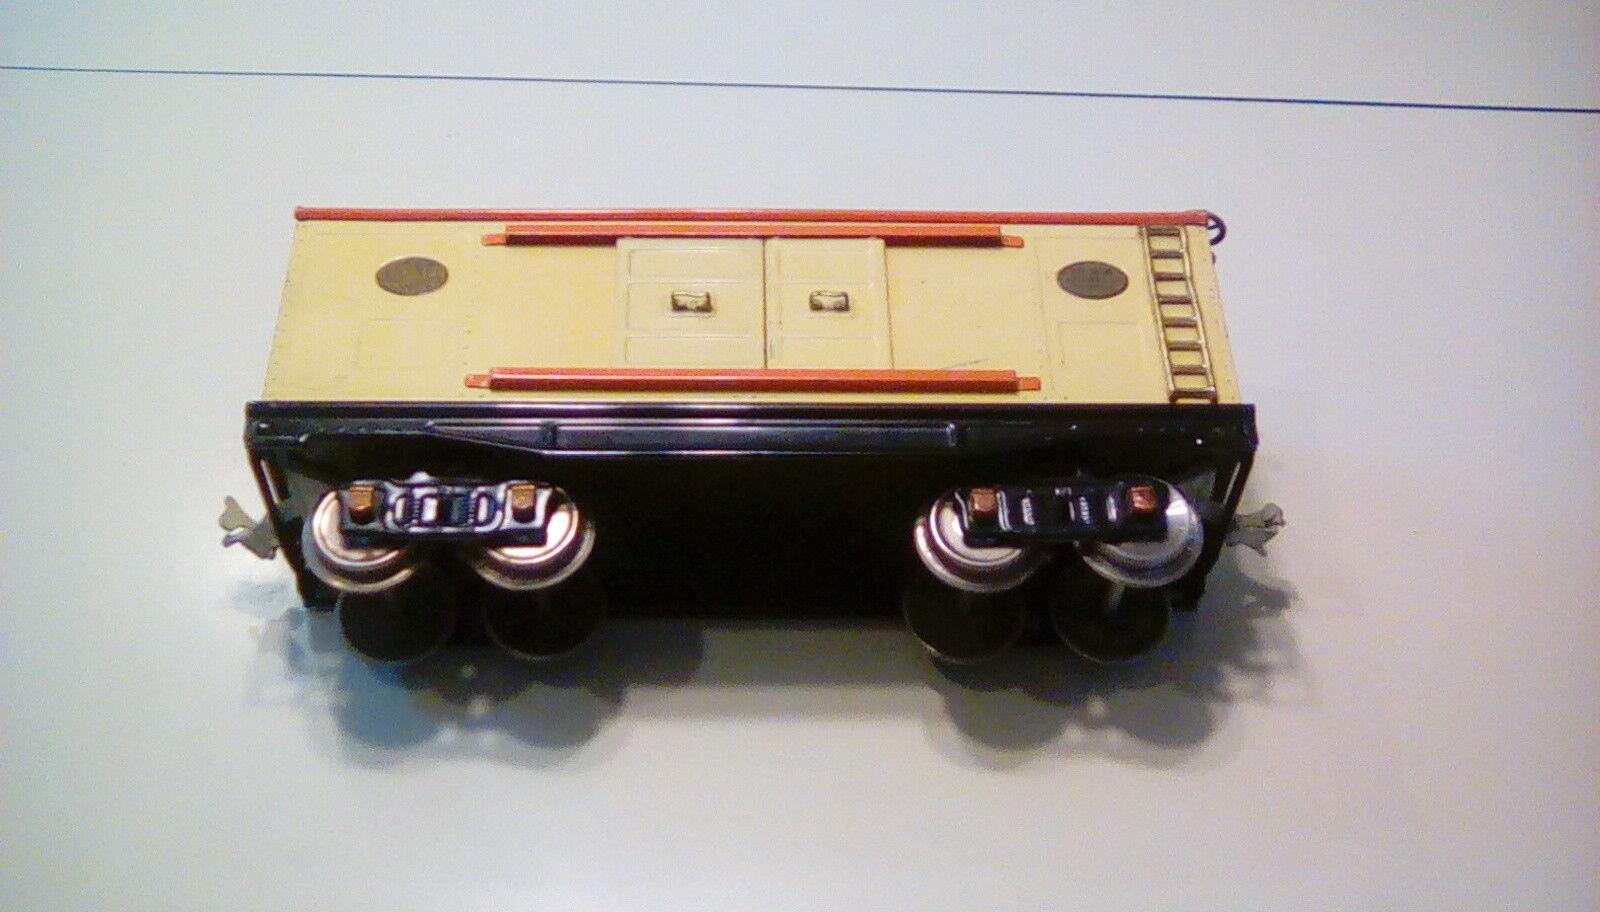 Toramuuei jnr 8620 tw-8620b aus japan